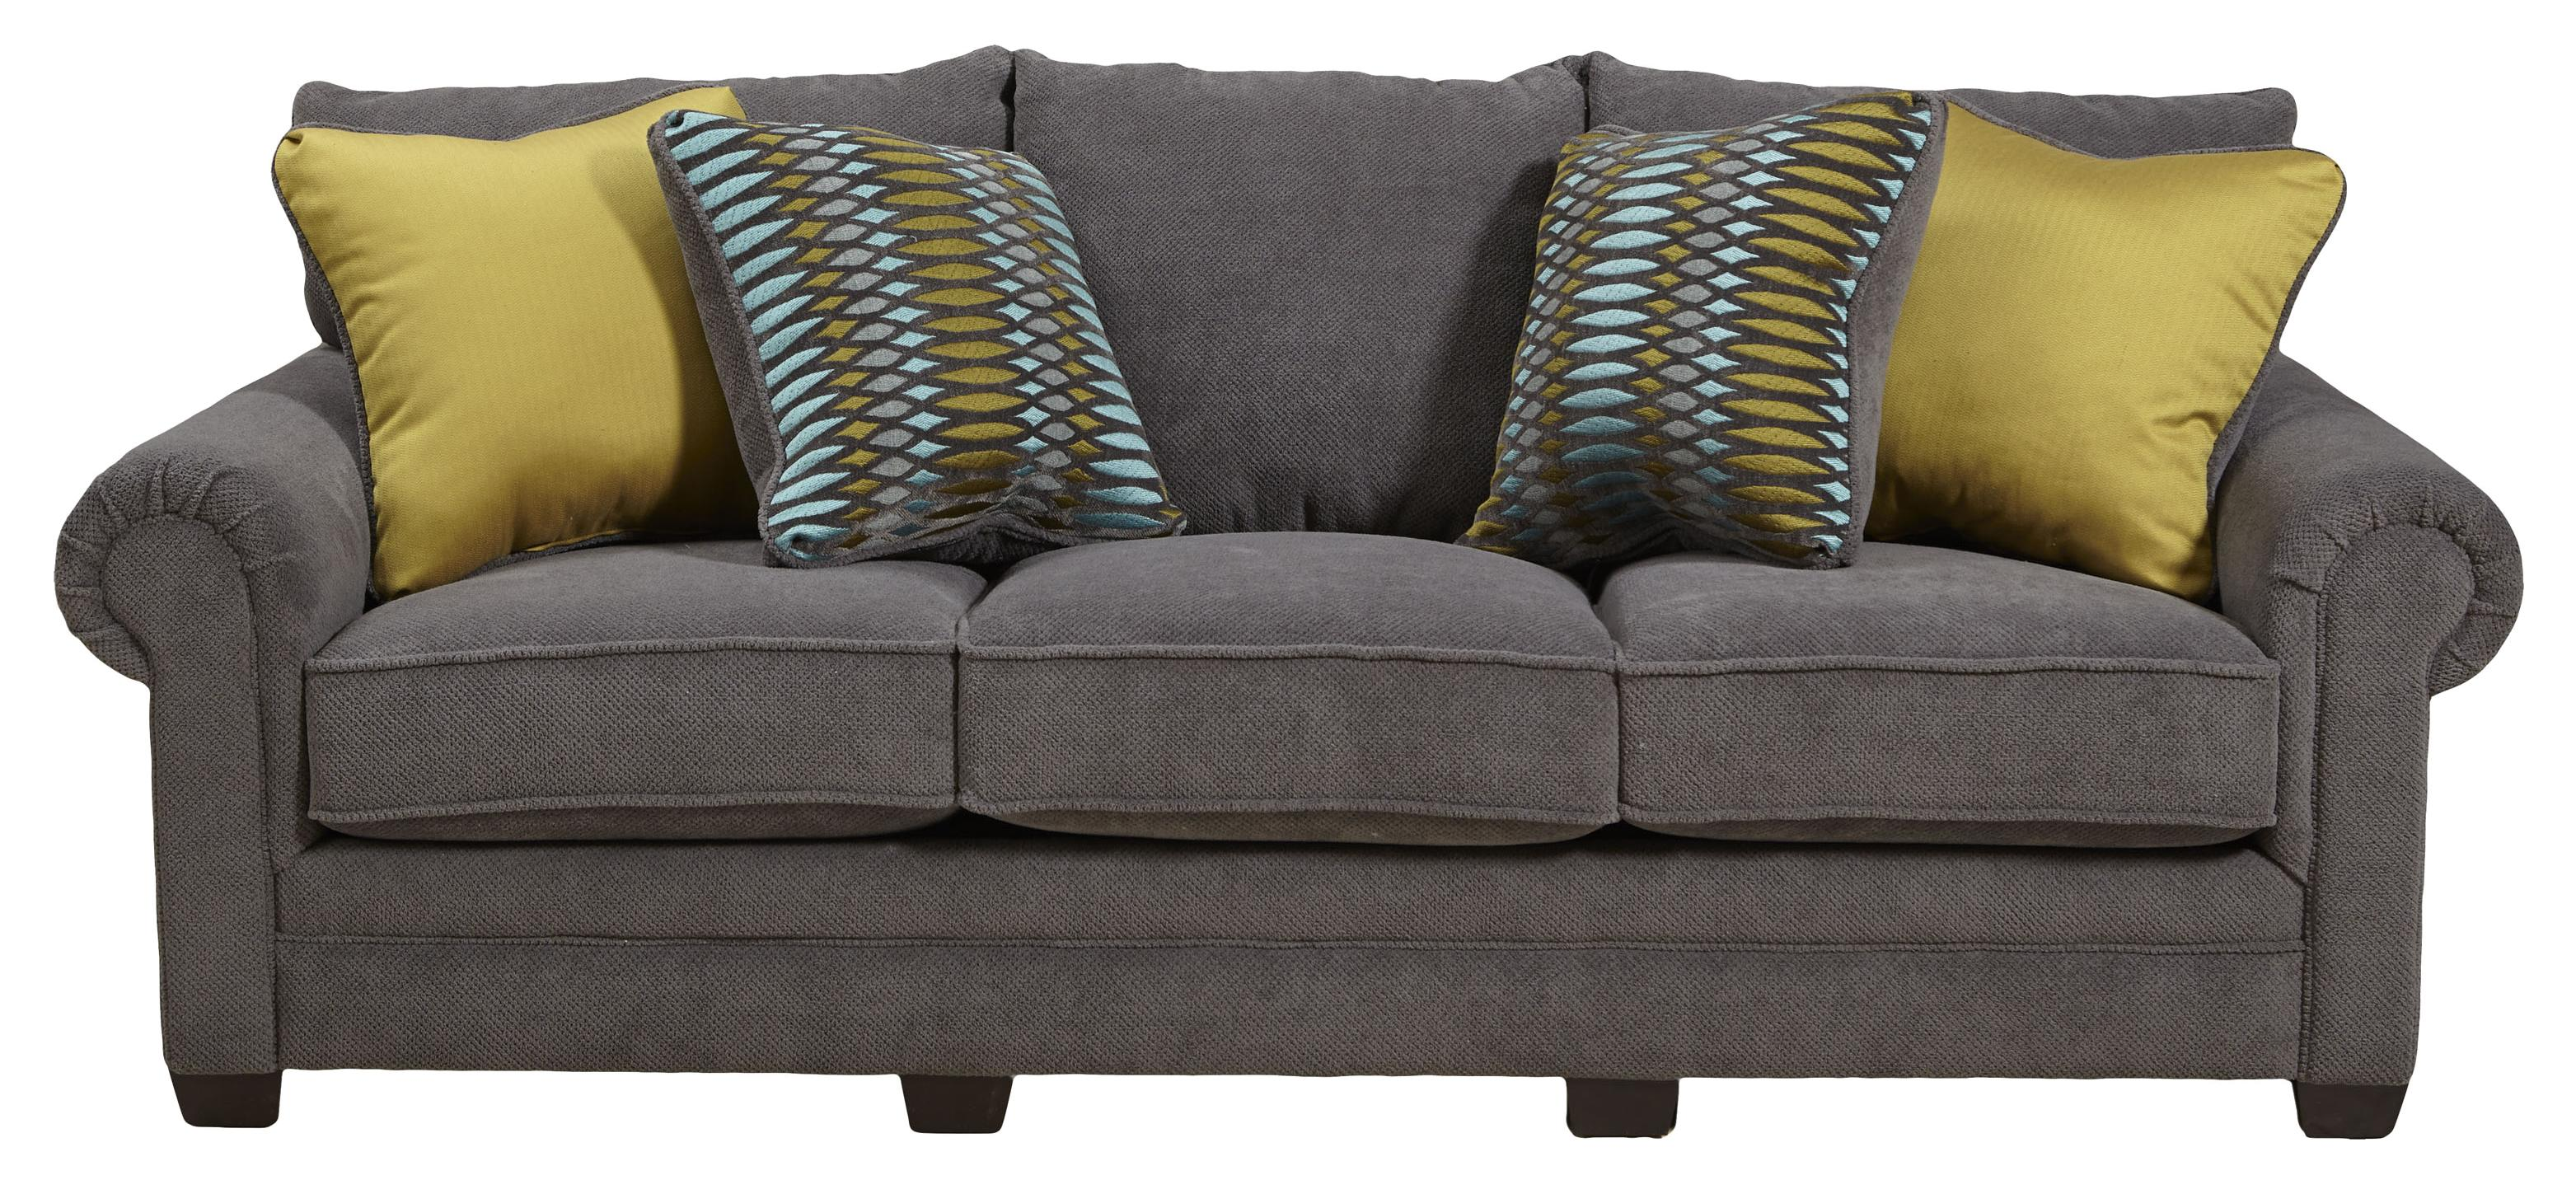 jackson furniture anniston 4342 03 stationary sofa lapeer furniture mattress center sofa. Black Bedroom Furniture Sets. Home Design Ideas